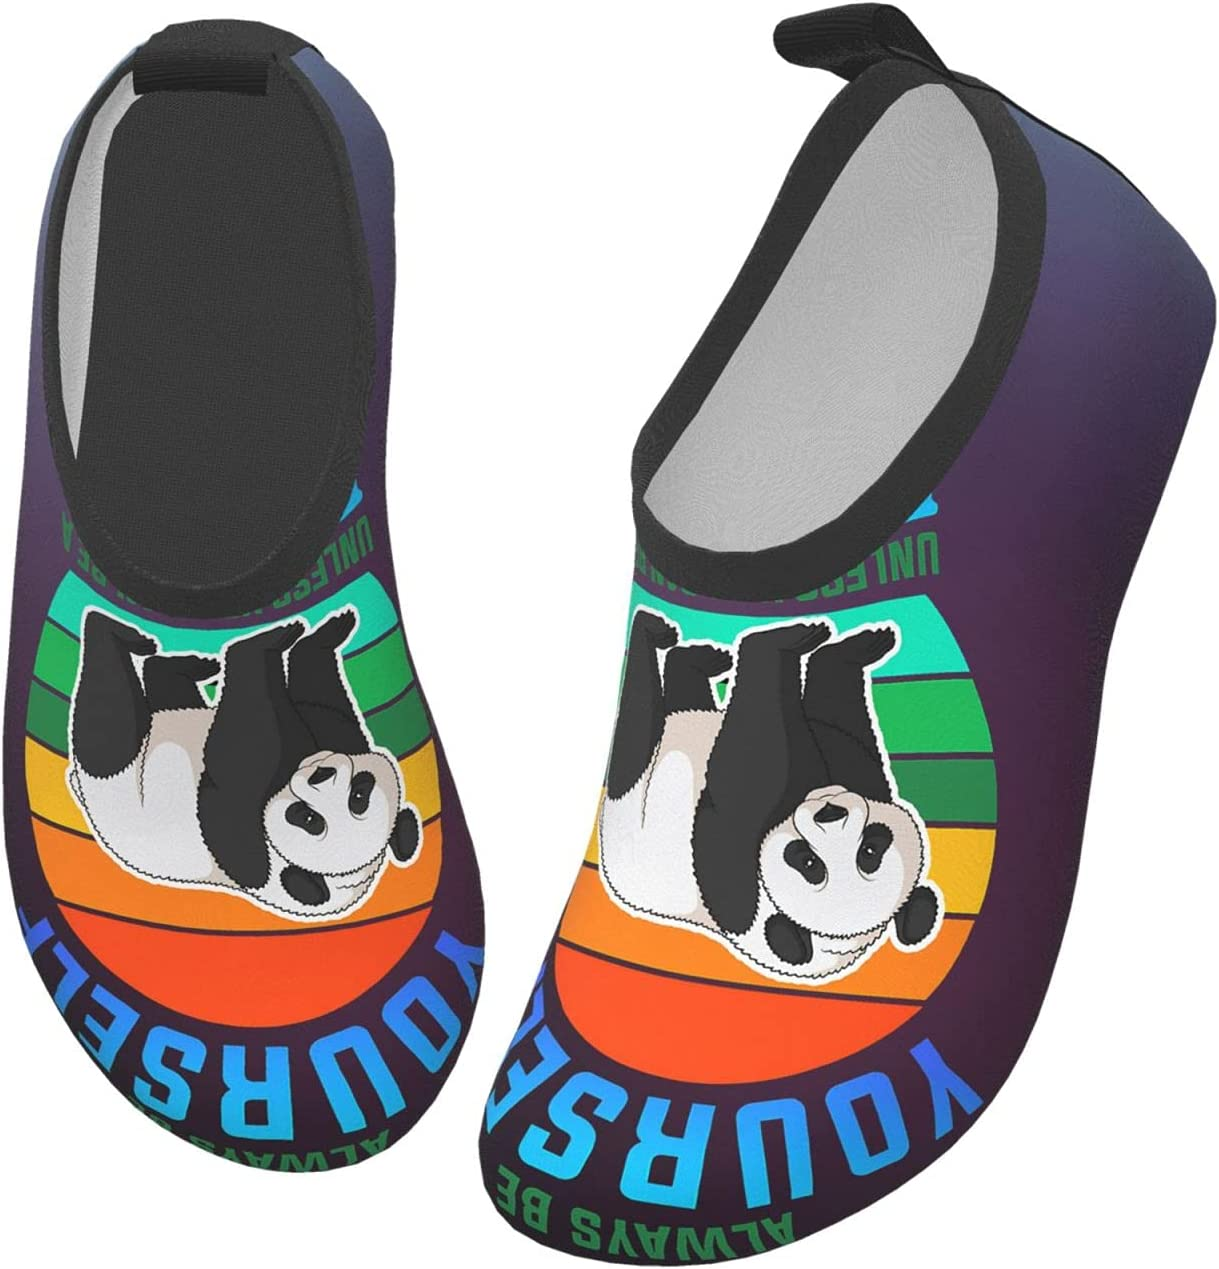 wobzfrok Bamboo Panda Spirit Animal Bear Kids Water Shoes Girls Boys Toddler Non-Slip Quick Dry Aqua Socks for Beach Swim Walking 22/23